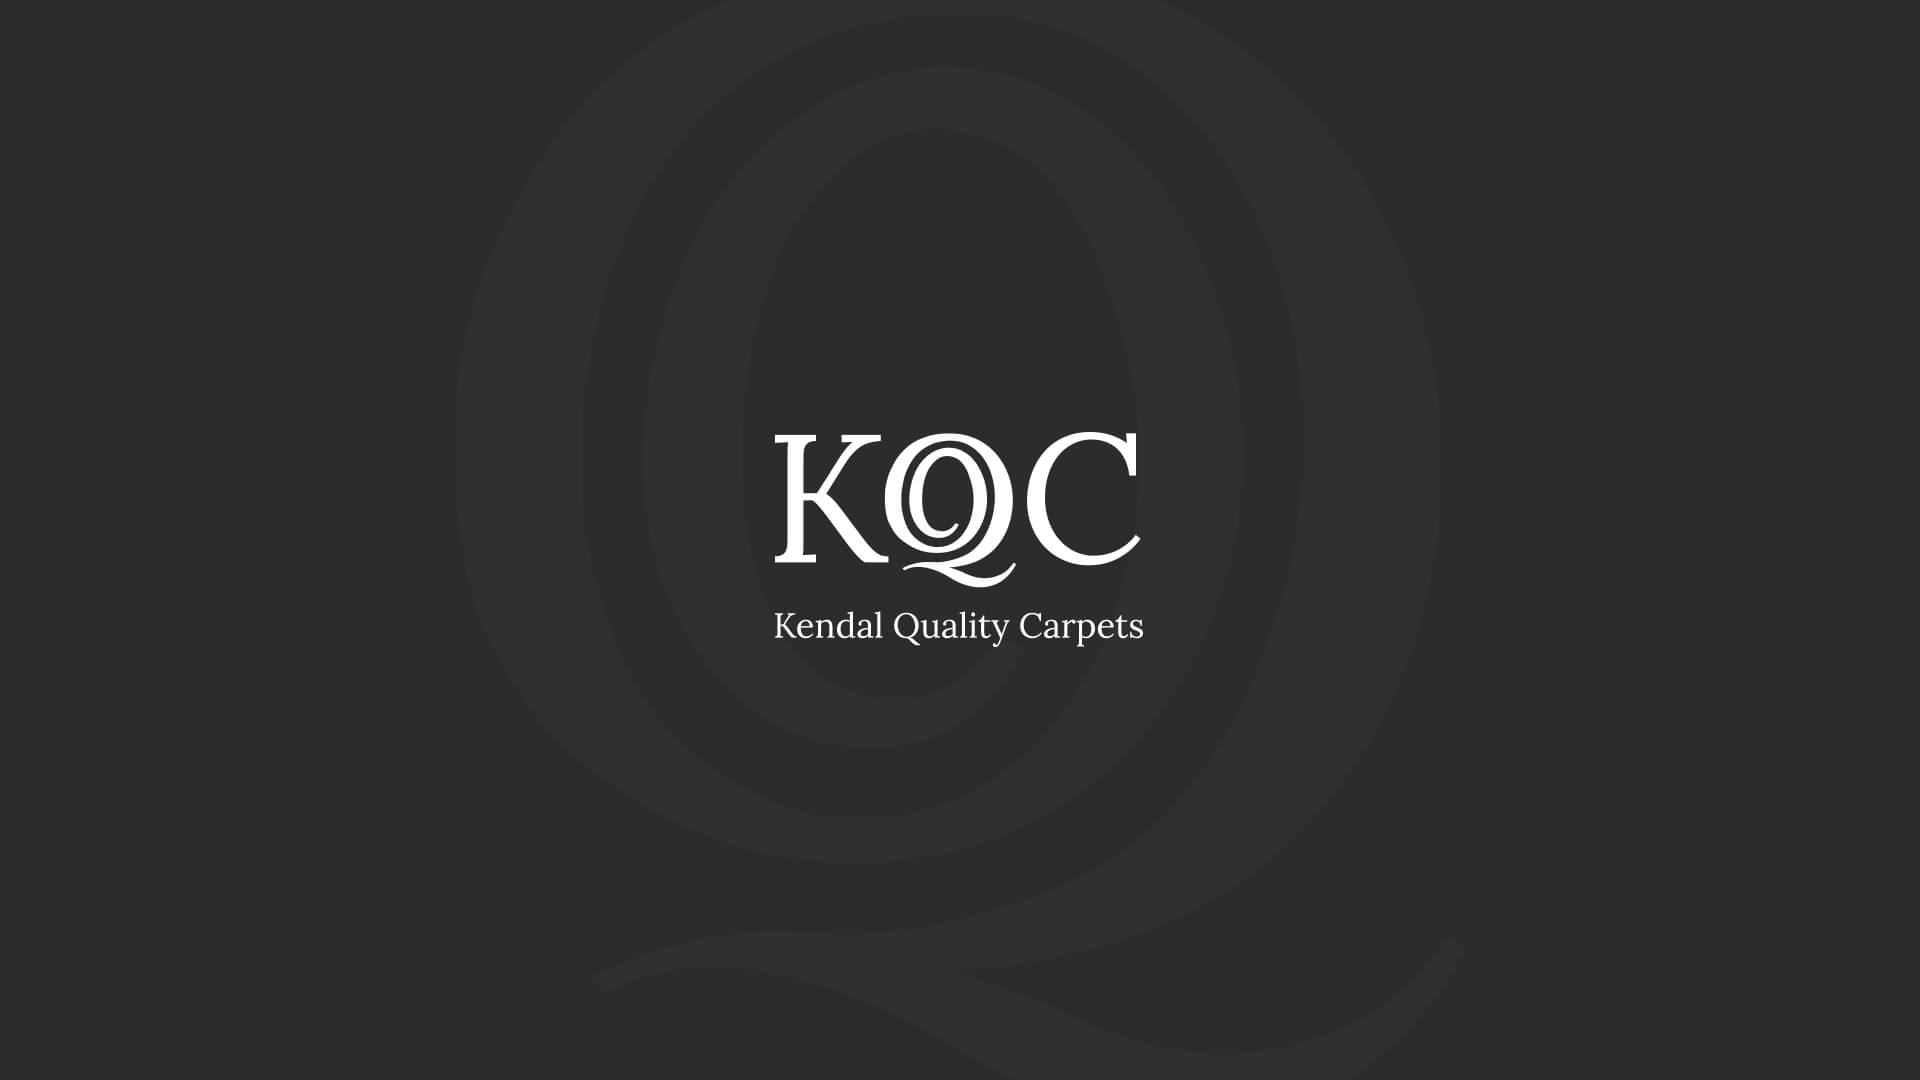 Kendal Quality Carpets